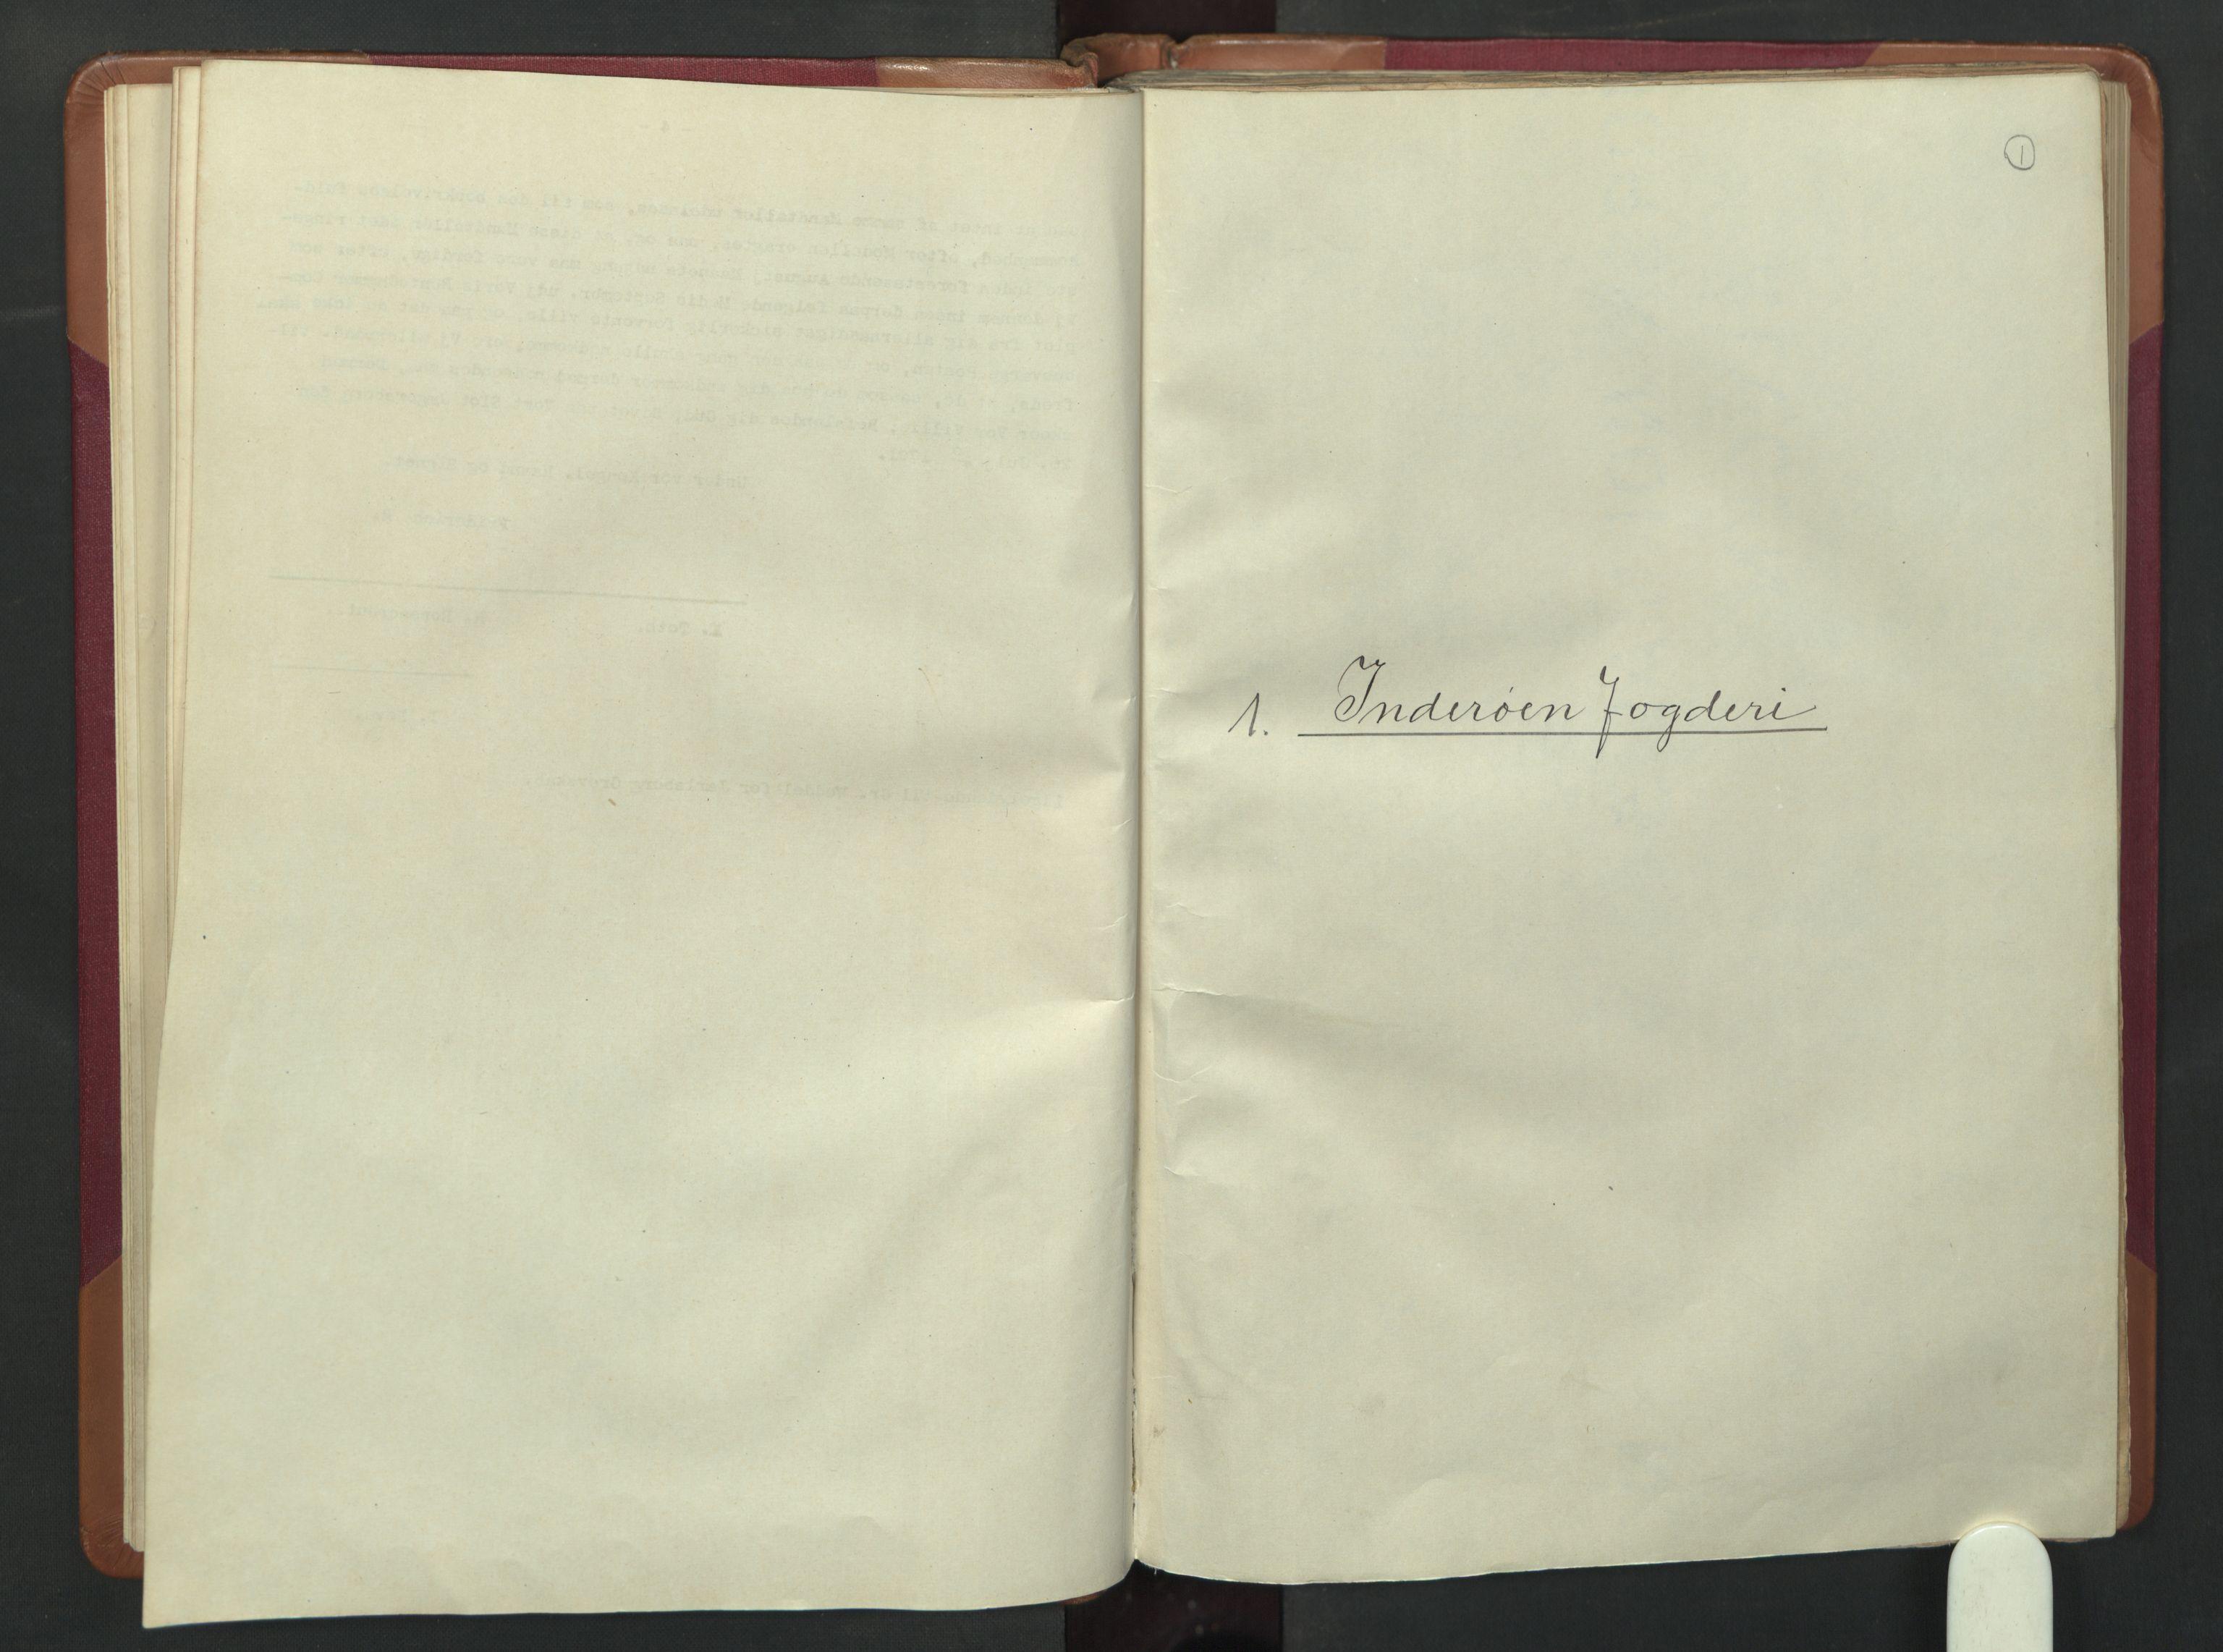 RA, Manntallet 1701, nr. 15: Inderøy fogderi og Namdal fogderi, 1701, s. 1